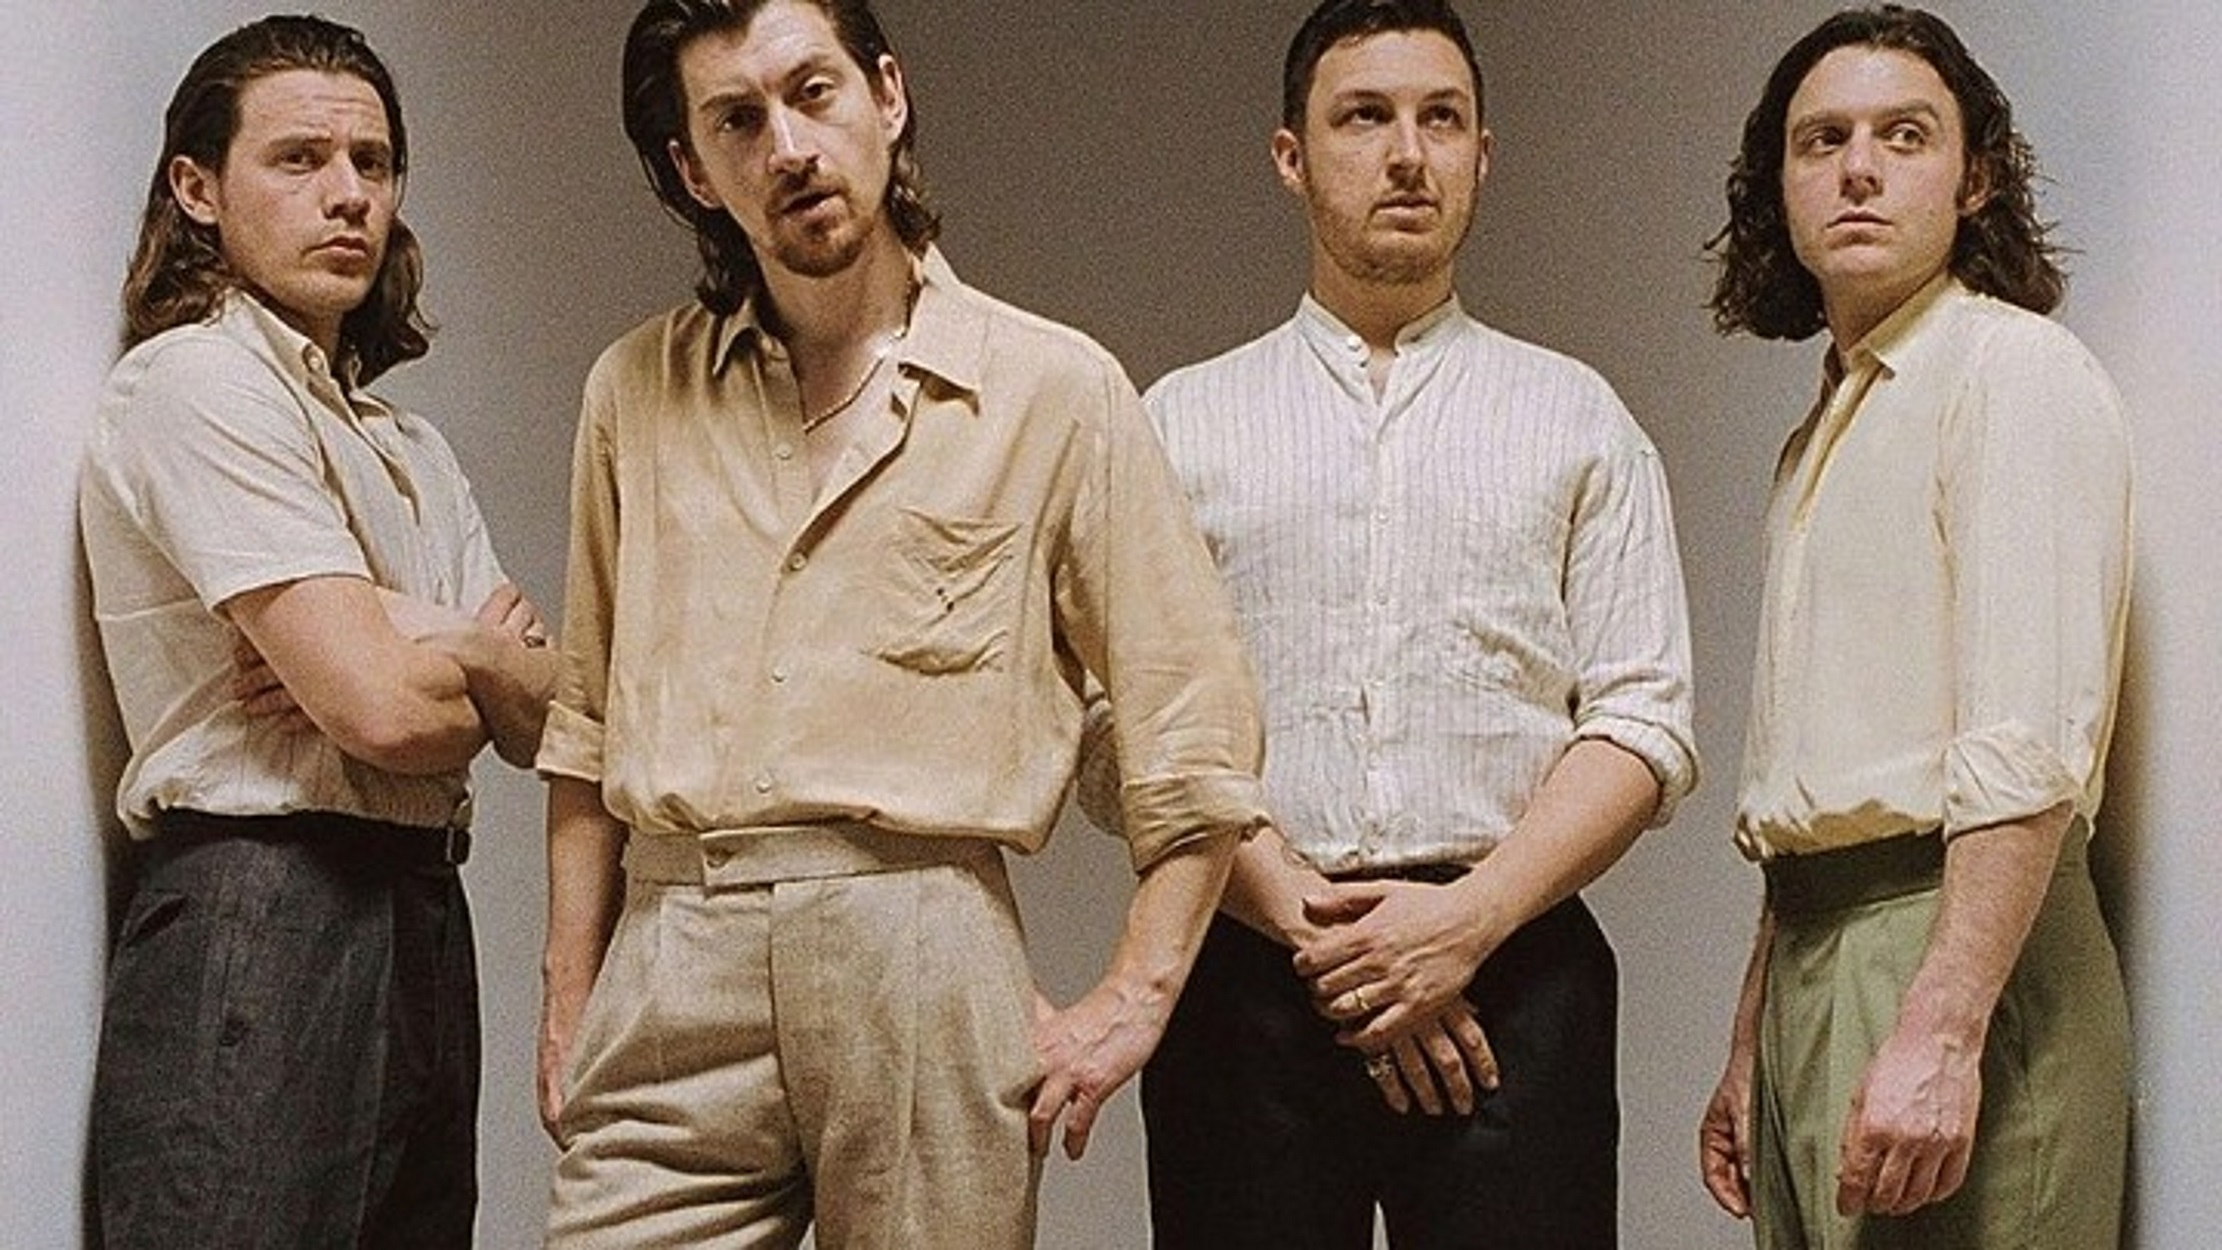 Arctic Monkeys: Άλμπουμ η συναυλία στο Royal AlbertHall